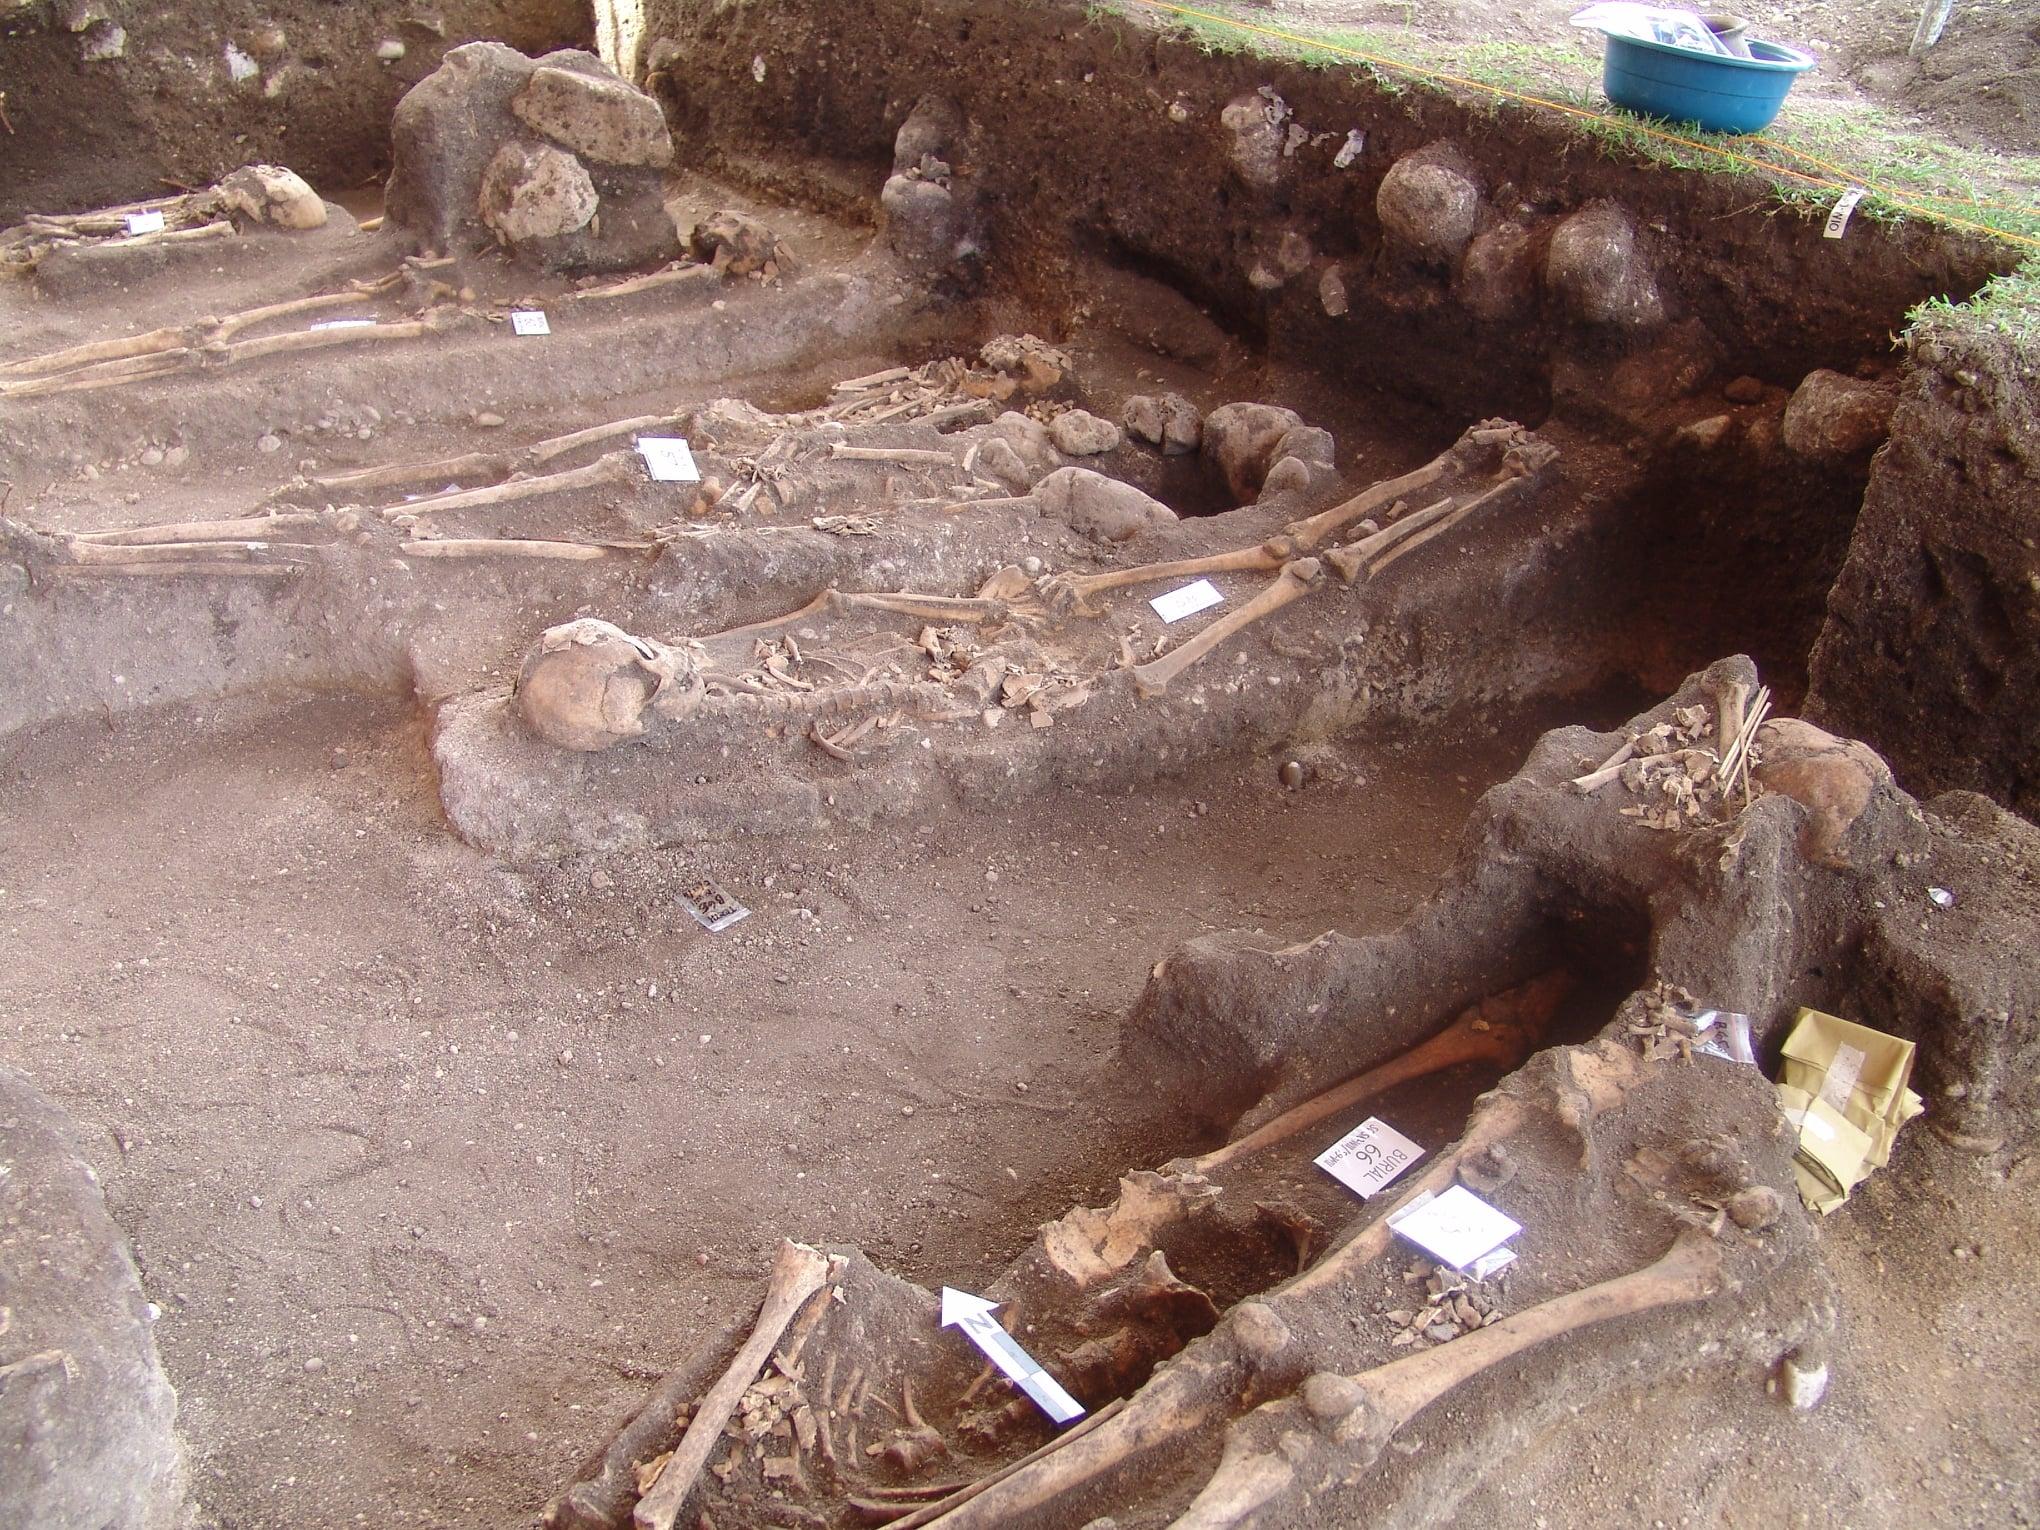 funerary practices Boljoon excavated burial site Early Historical Burials Excavated in Boljoon, Cebu [Philippine History]